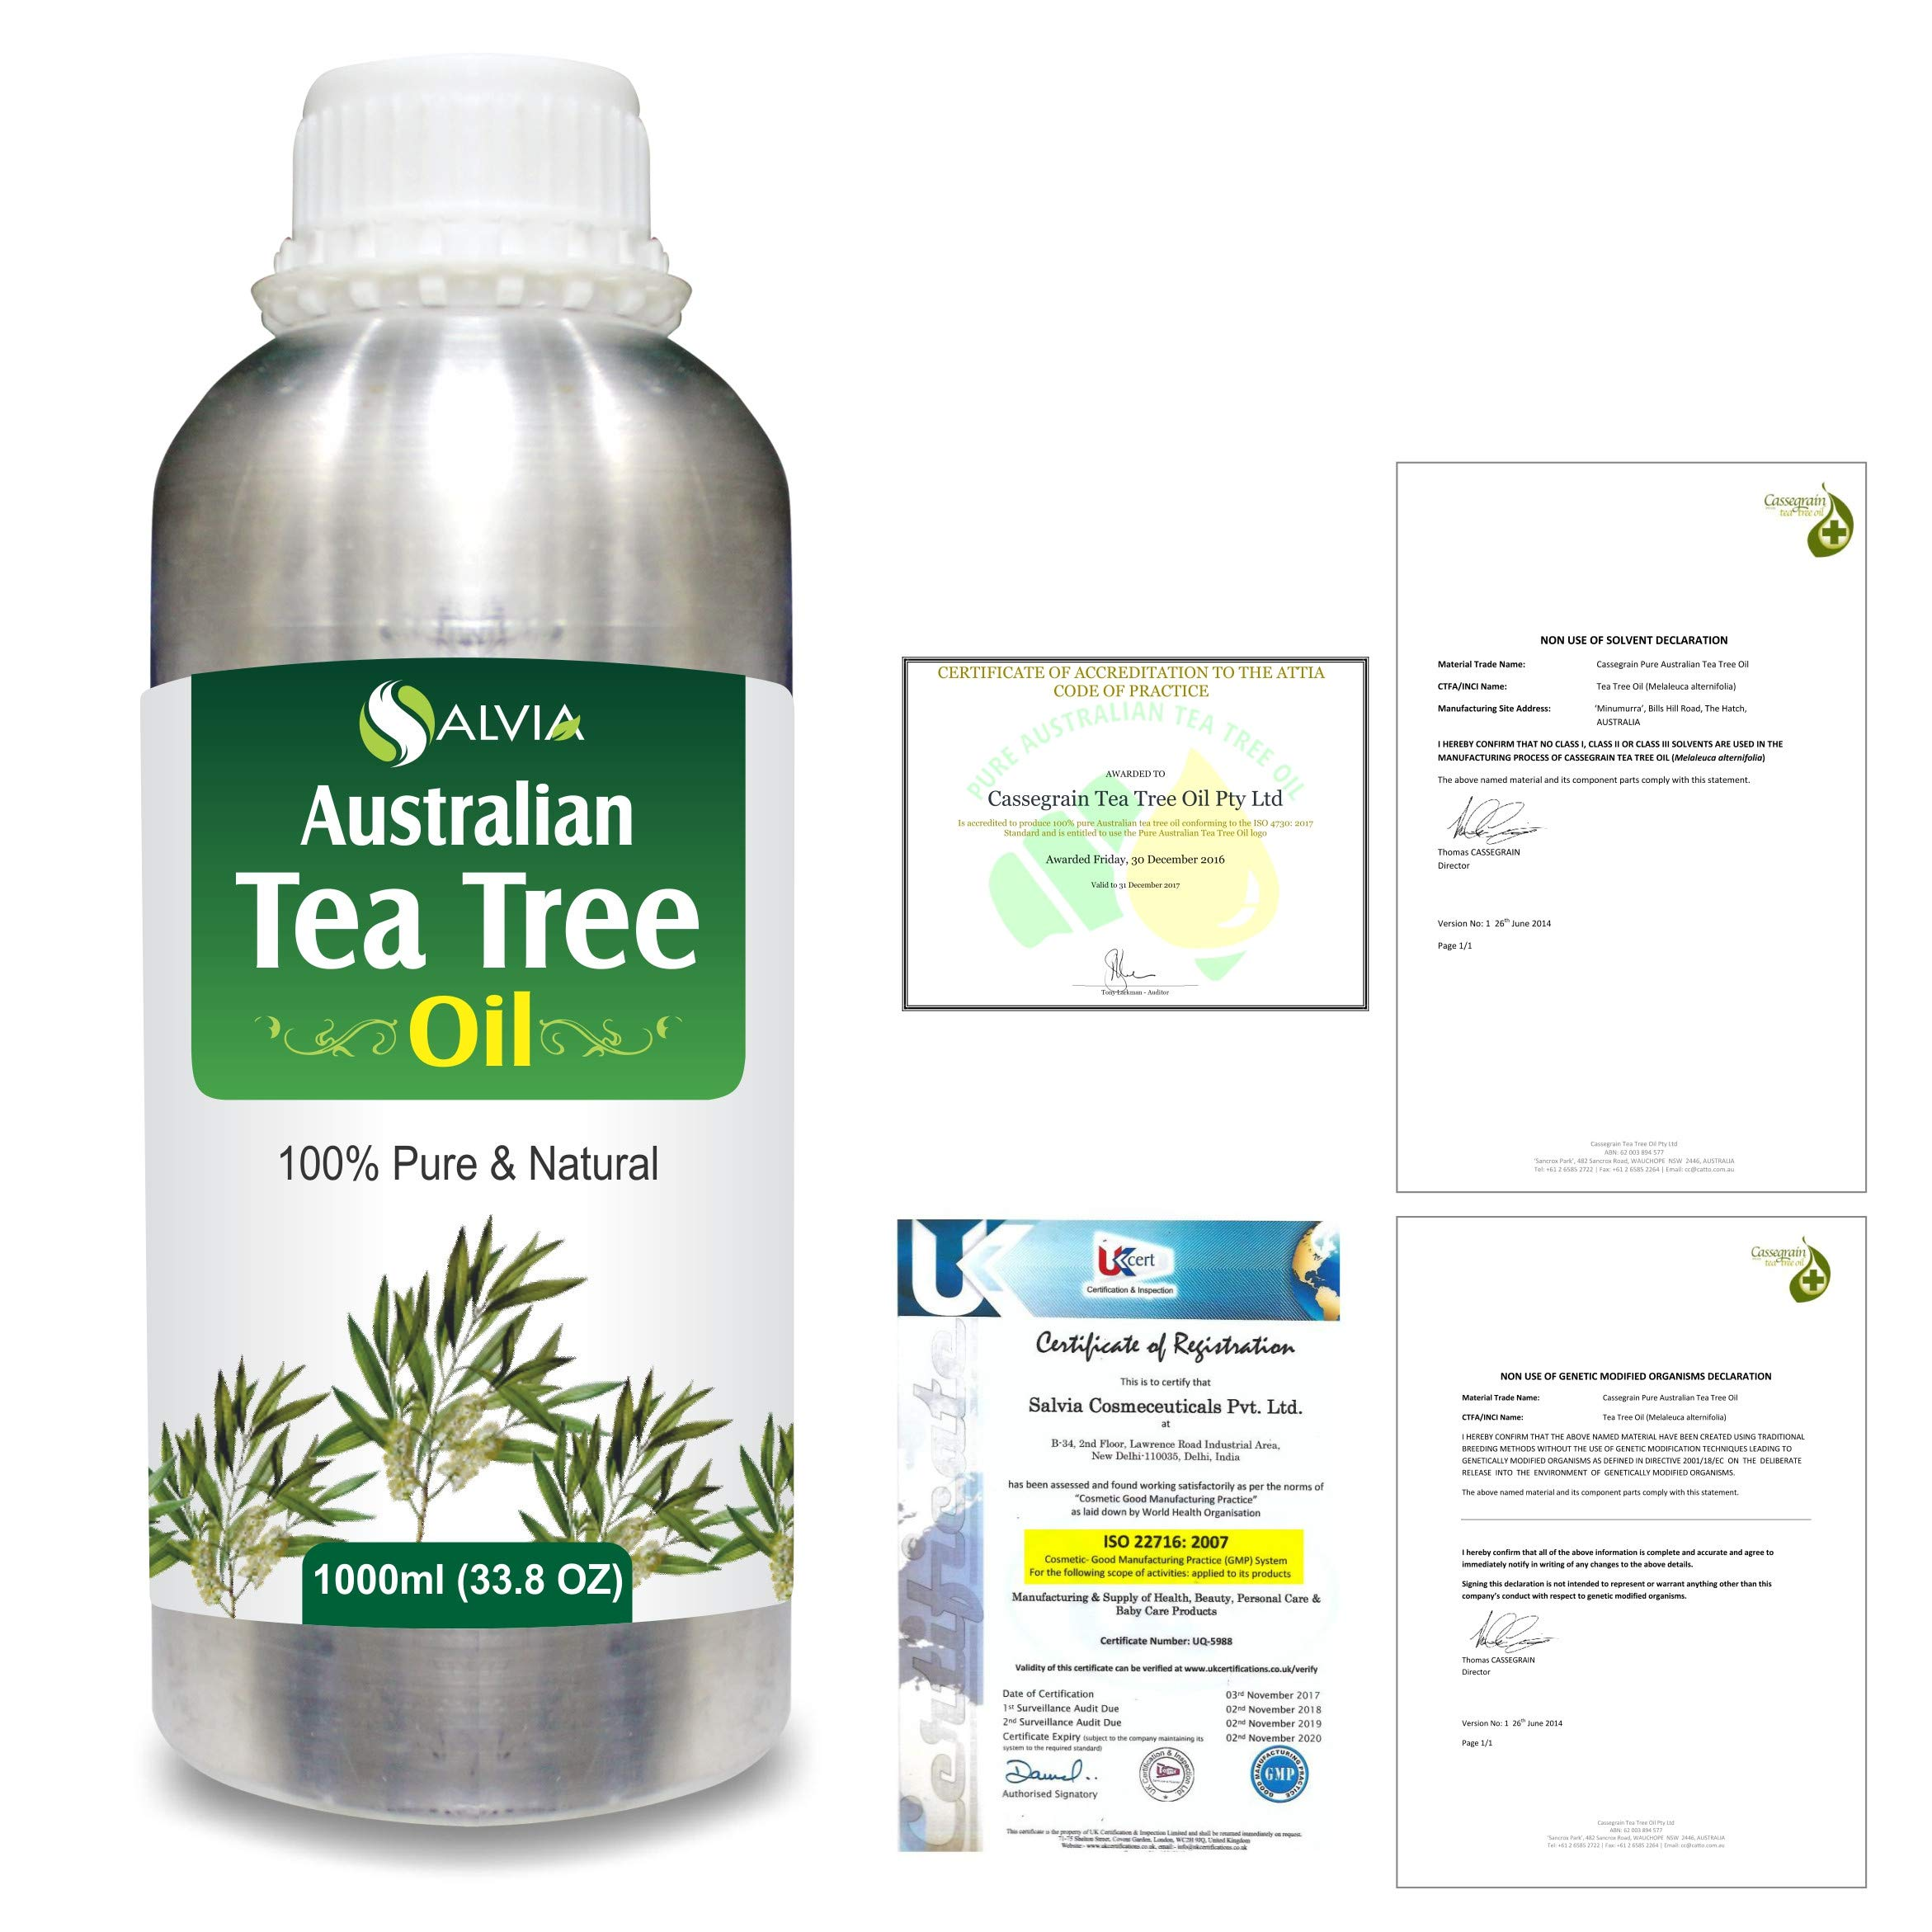 Tea Tree (Melaleuca alternifolia) 100% Pure Australian Certified Non GMO Essential Oil 1000ml/33.8 fl. oz. Express Shipping